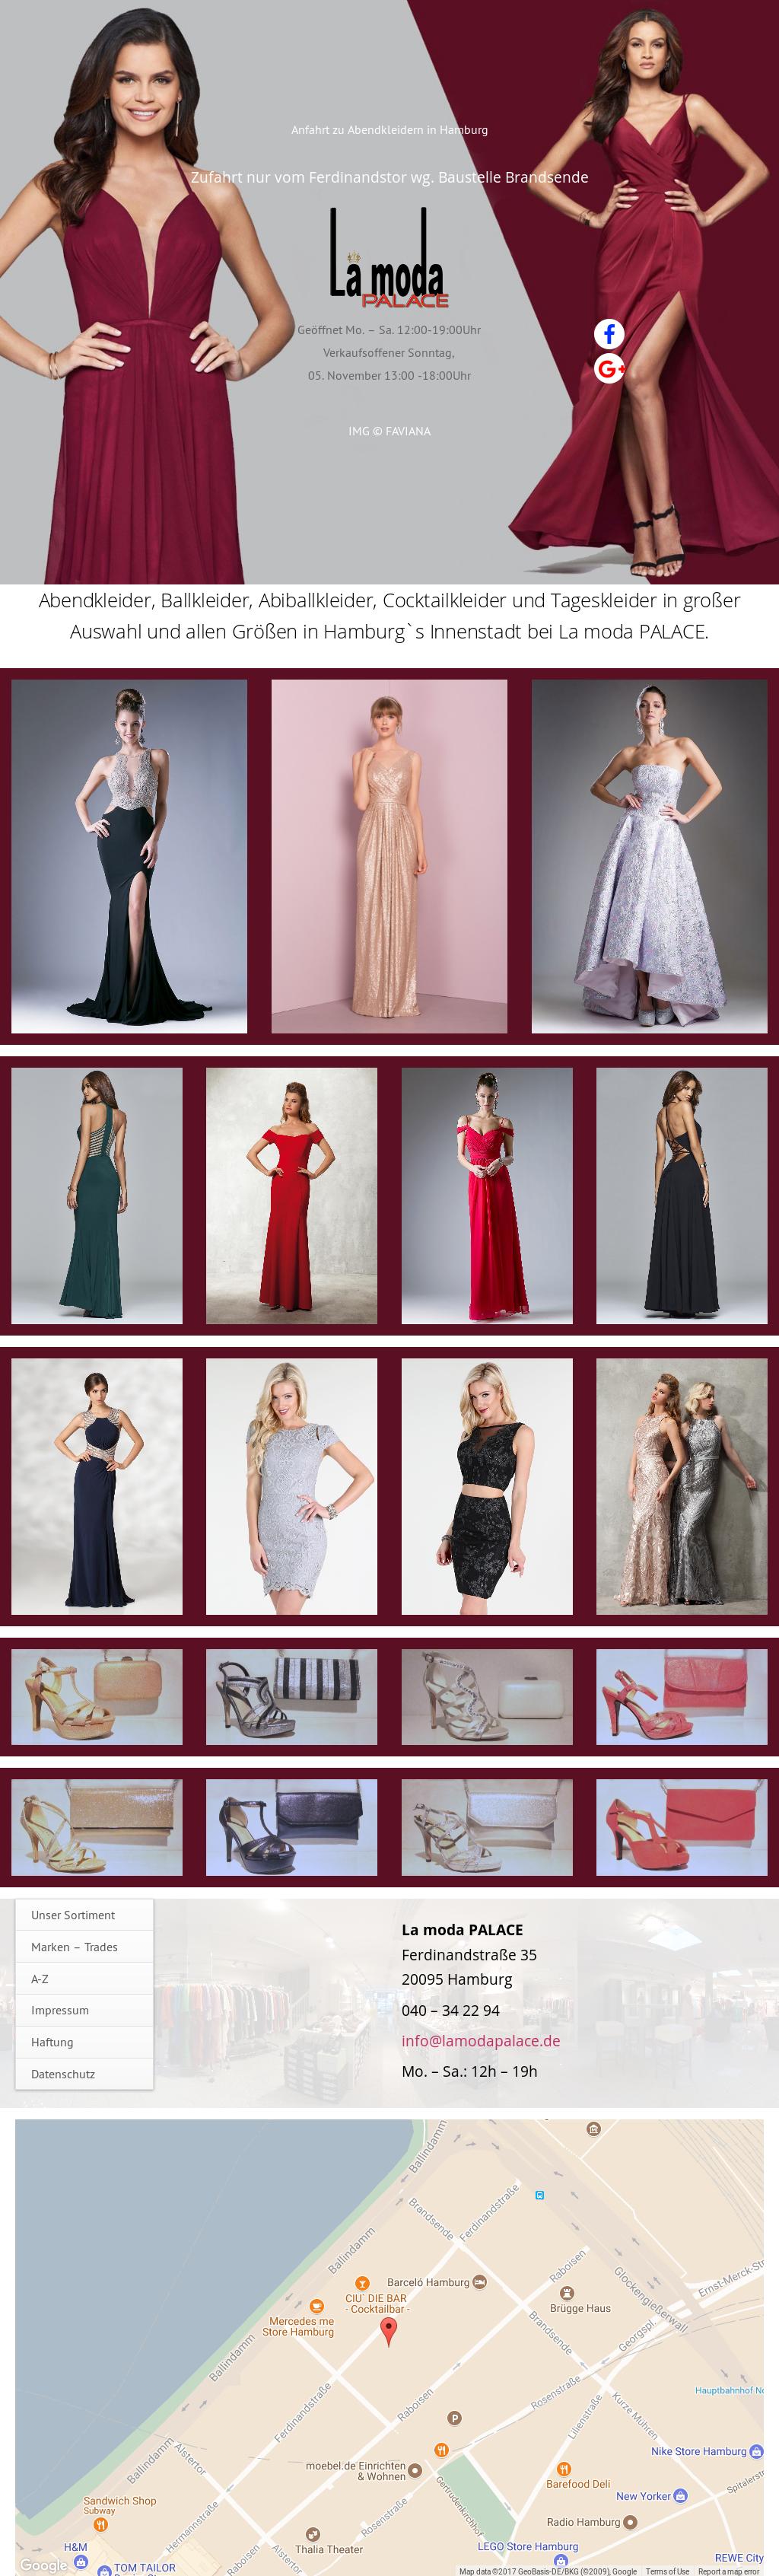 La Moda Palace Abendkleider Competitors, Revenue and Employees